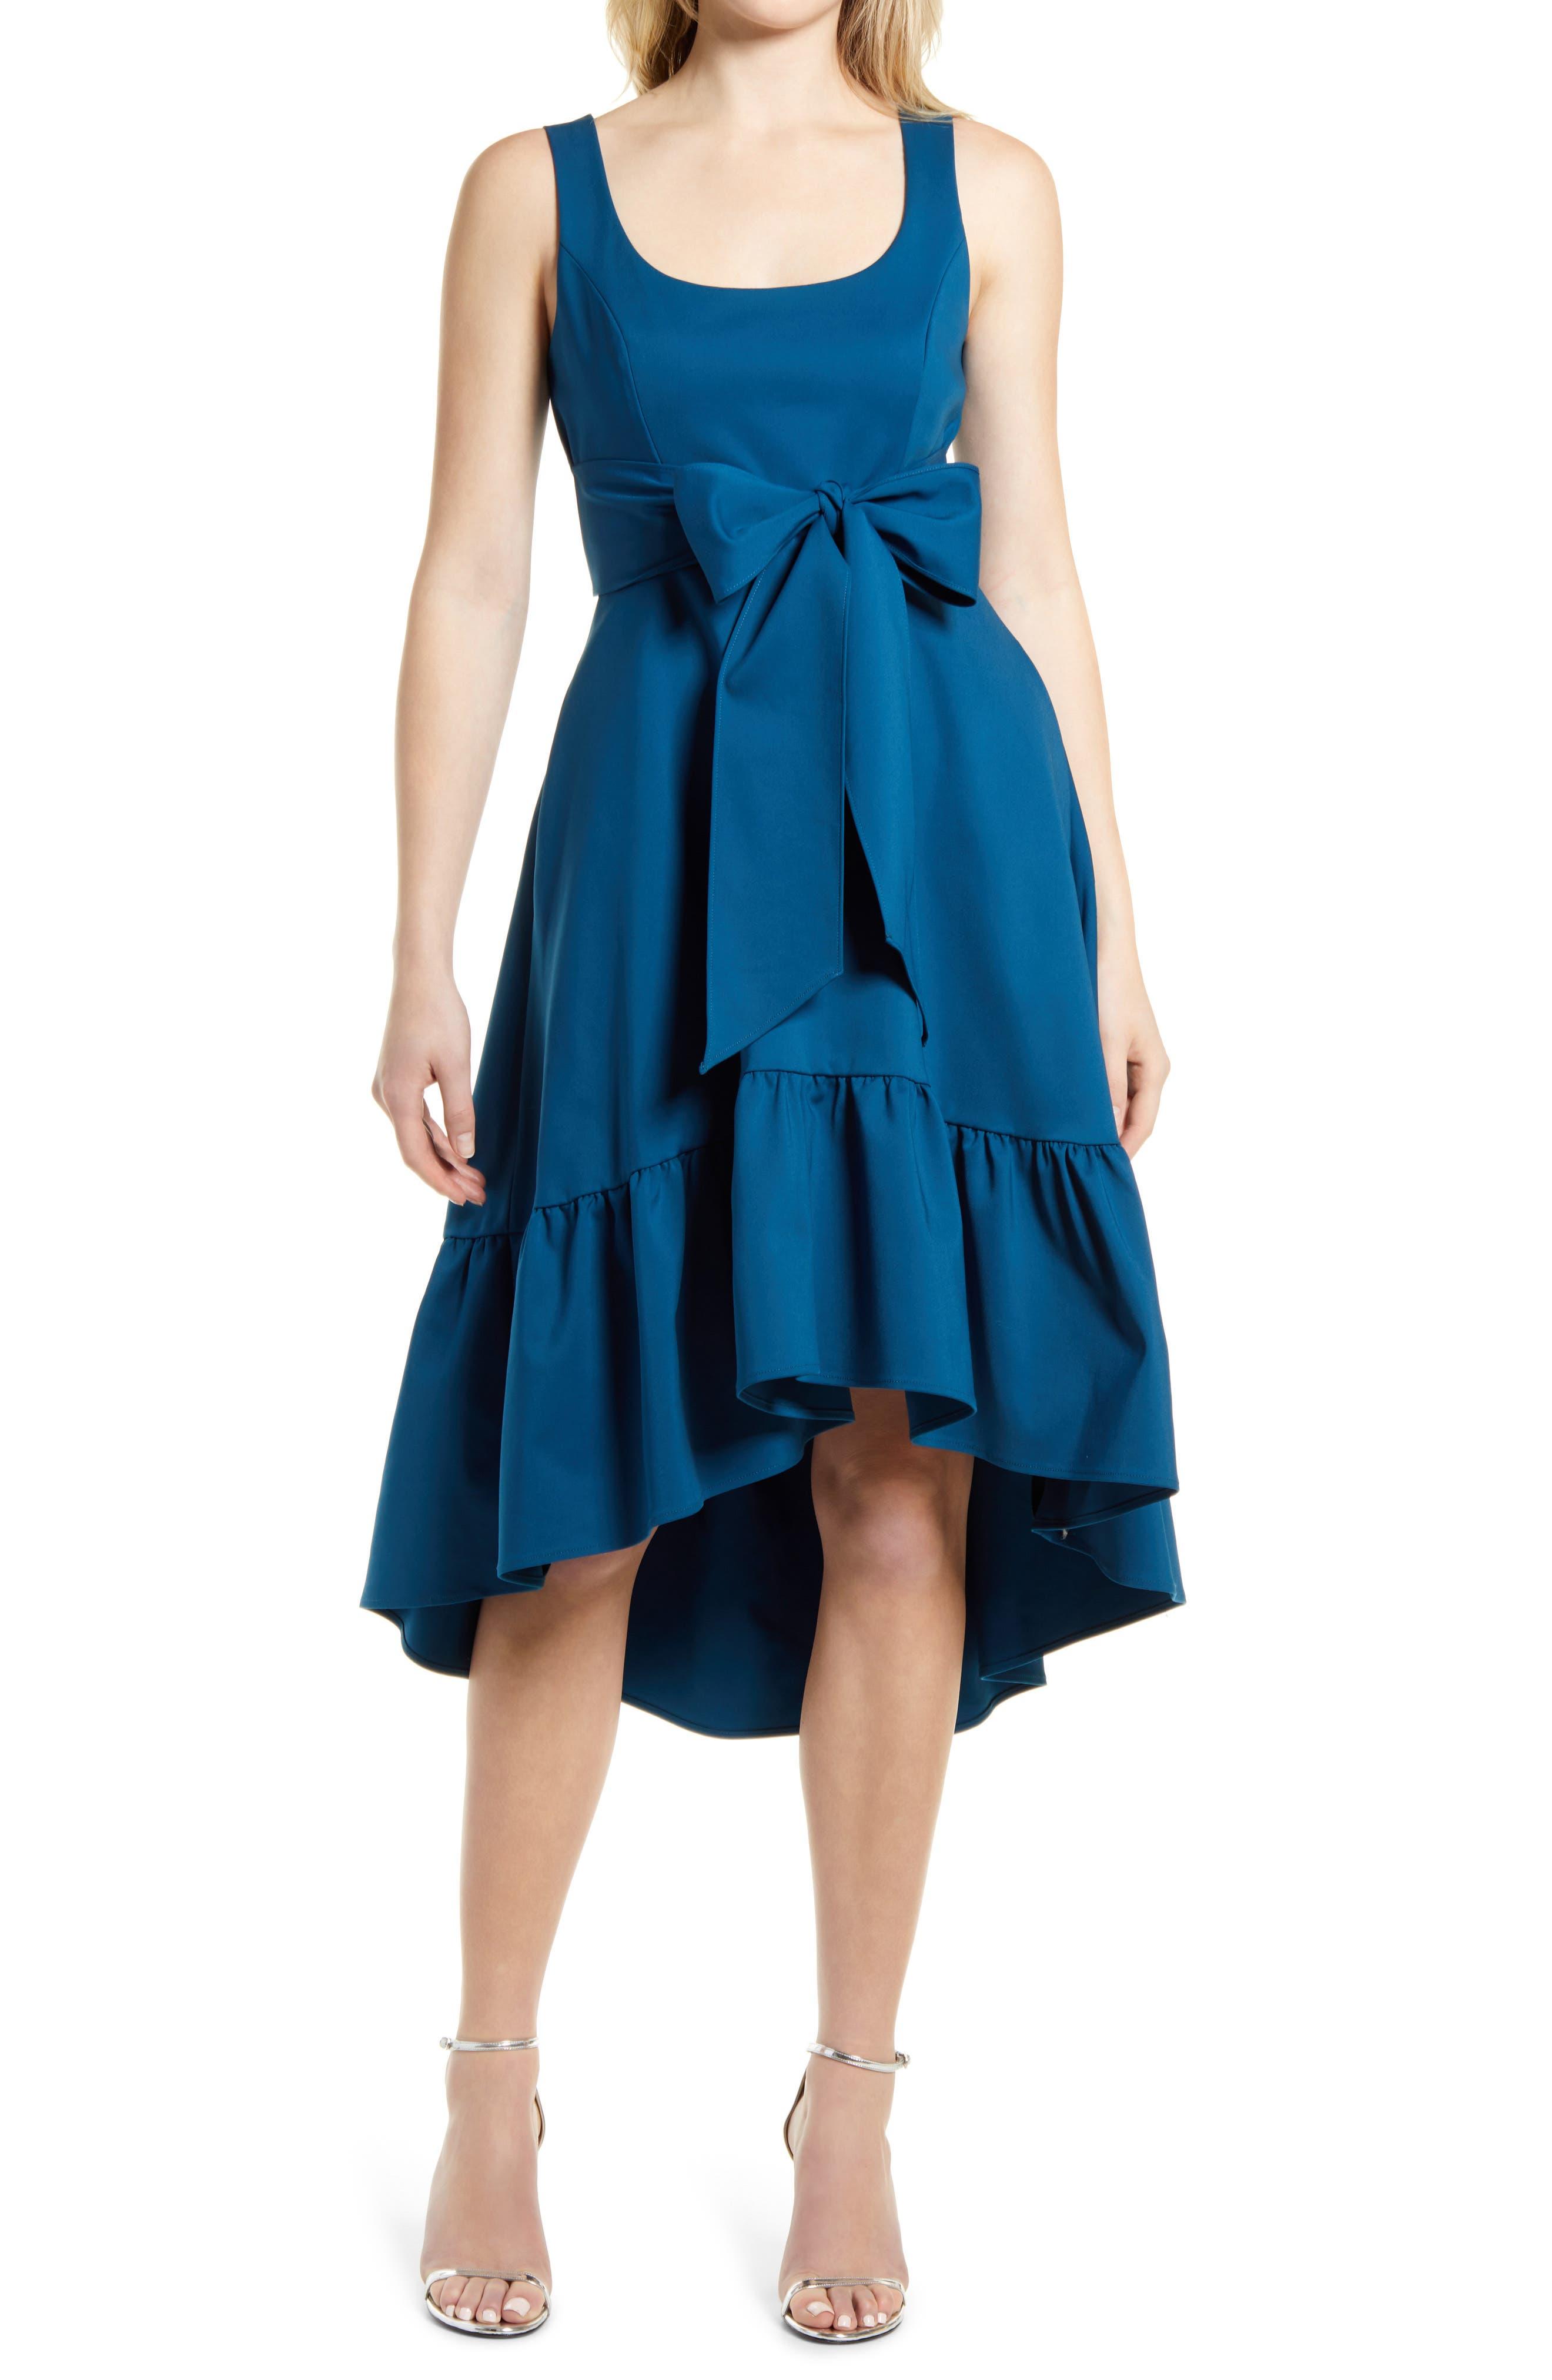 Women's Mark & James Badgley Mischka High/low Ruffle Hem Dress